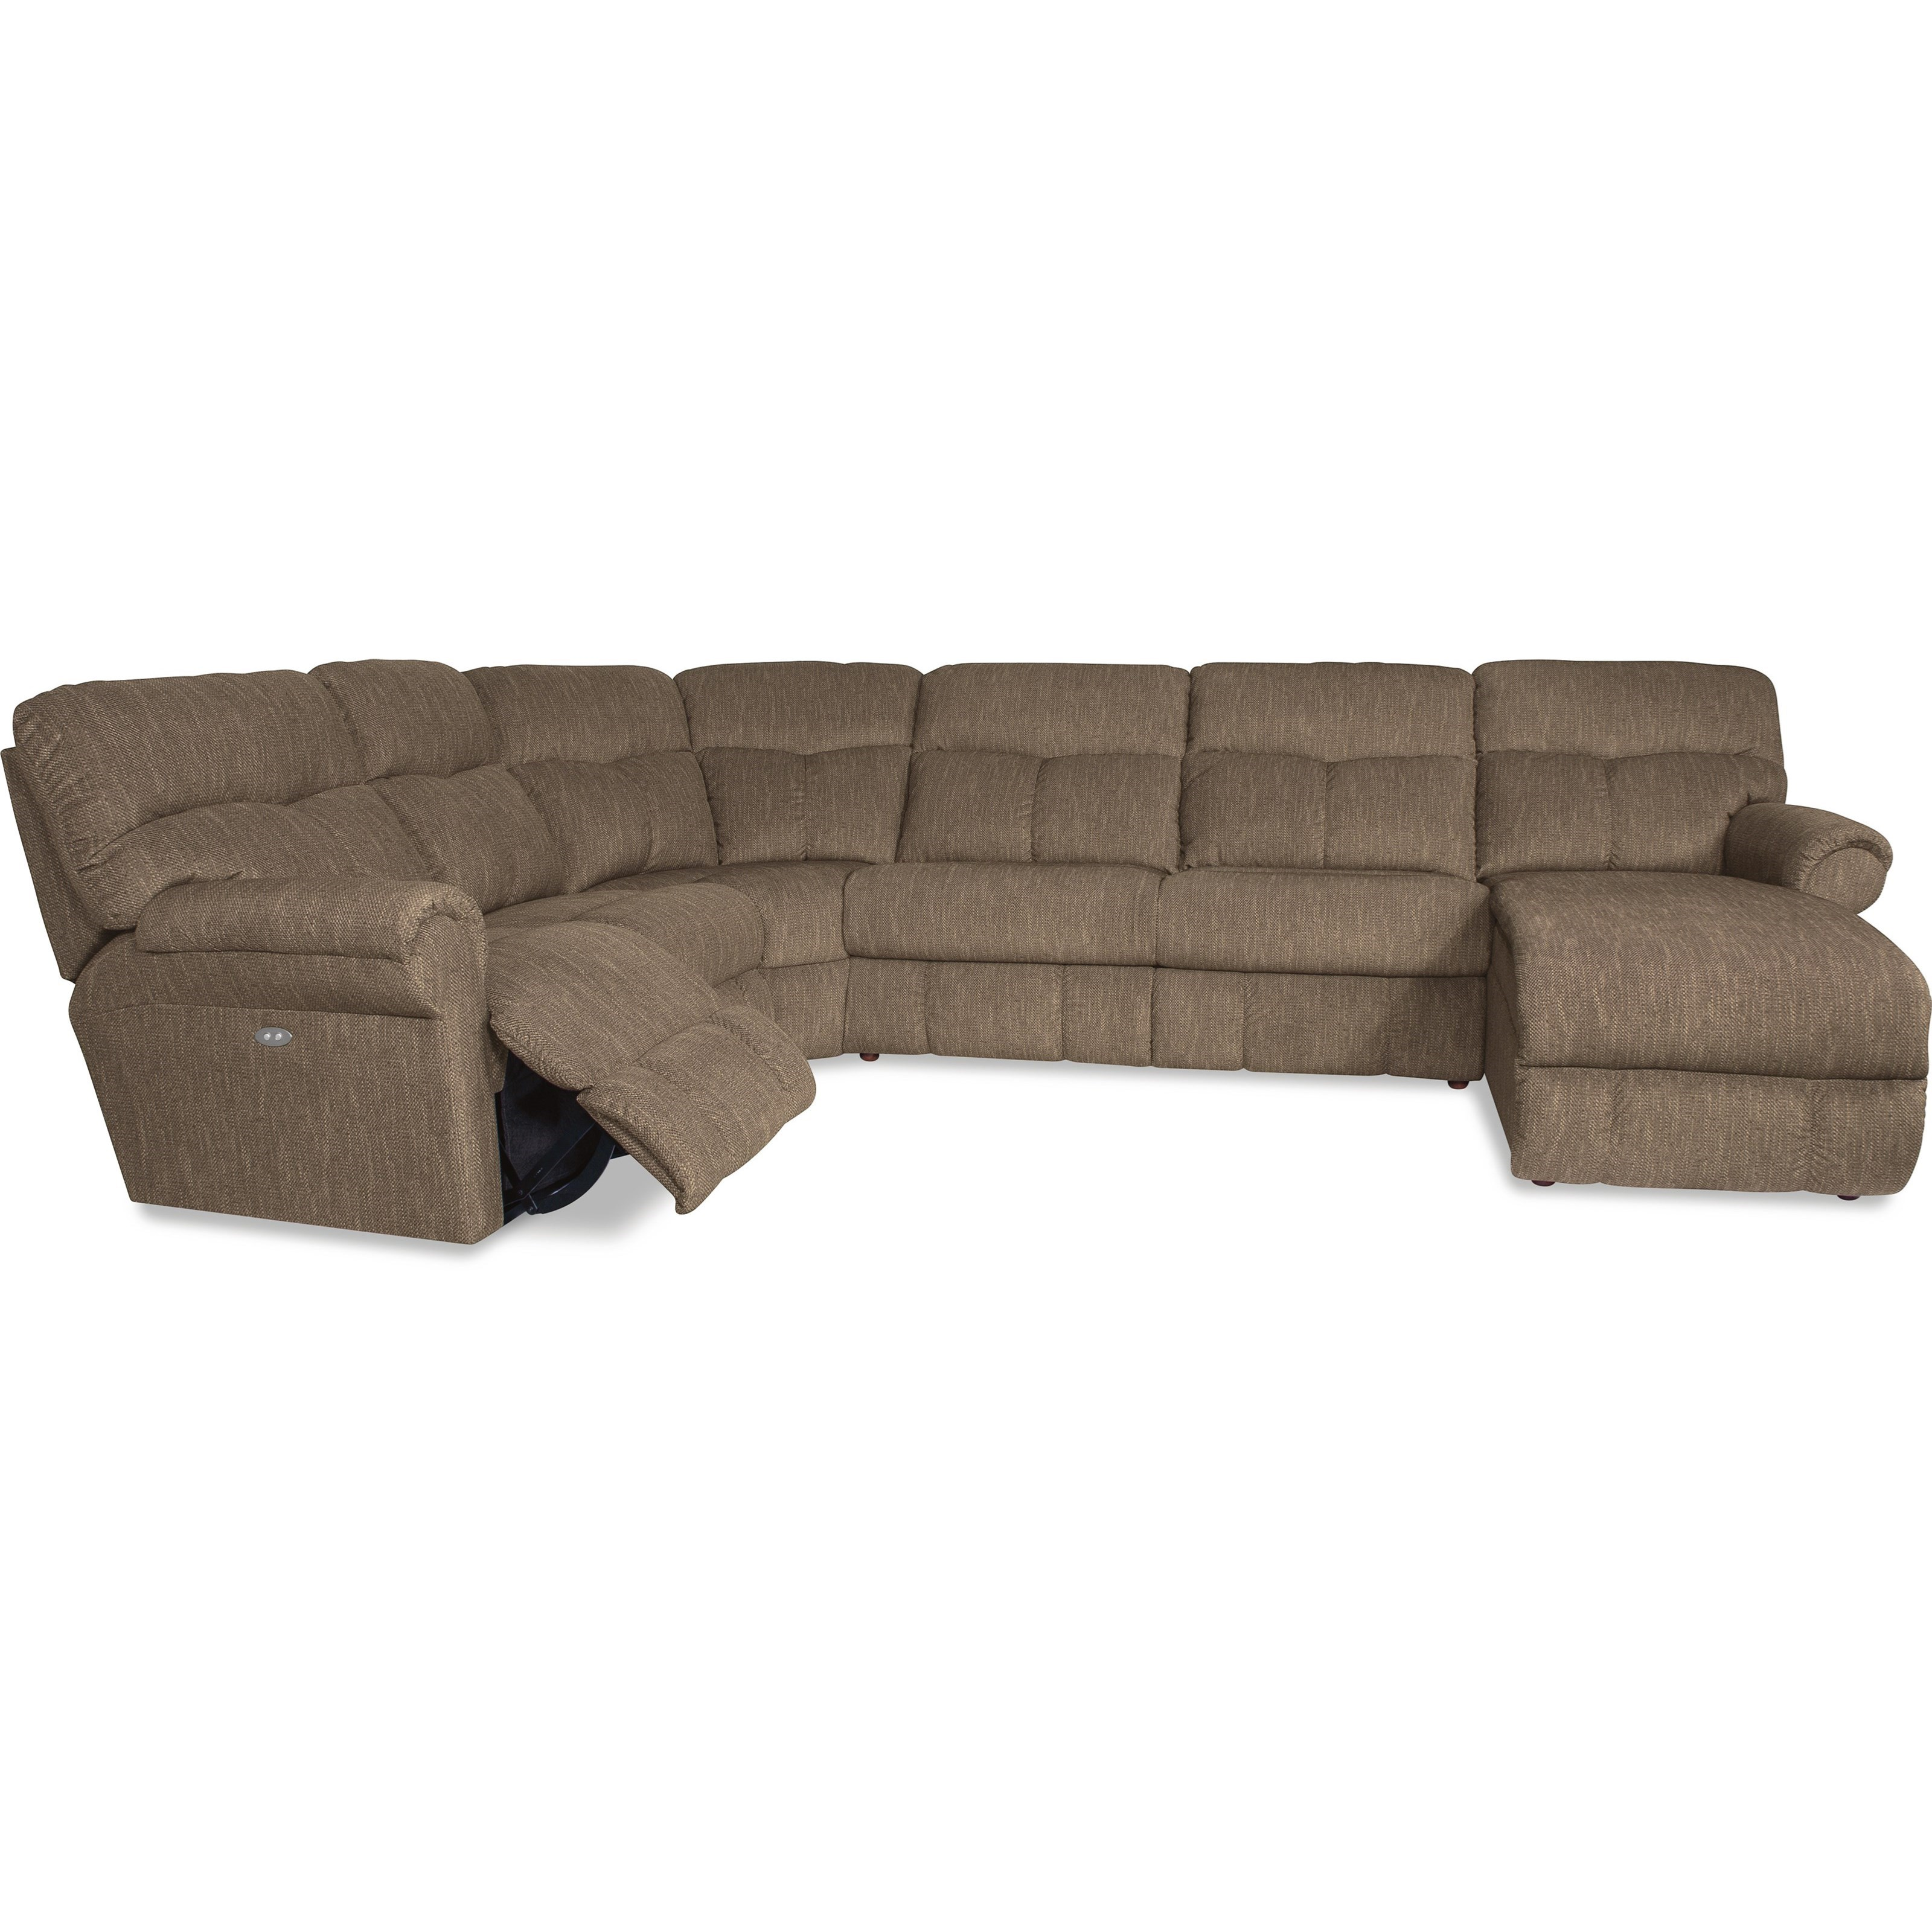 La z boy sheldon casual four piece reclining sectional for La z boy sectional sofas